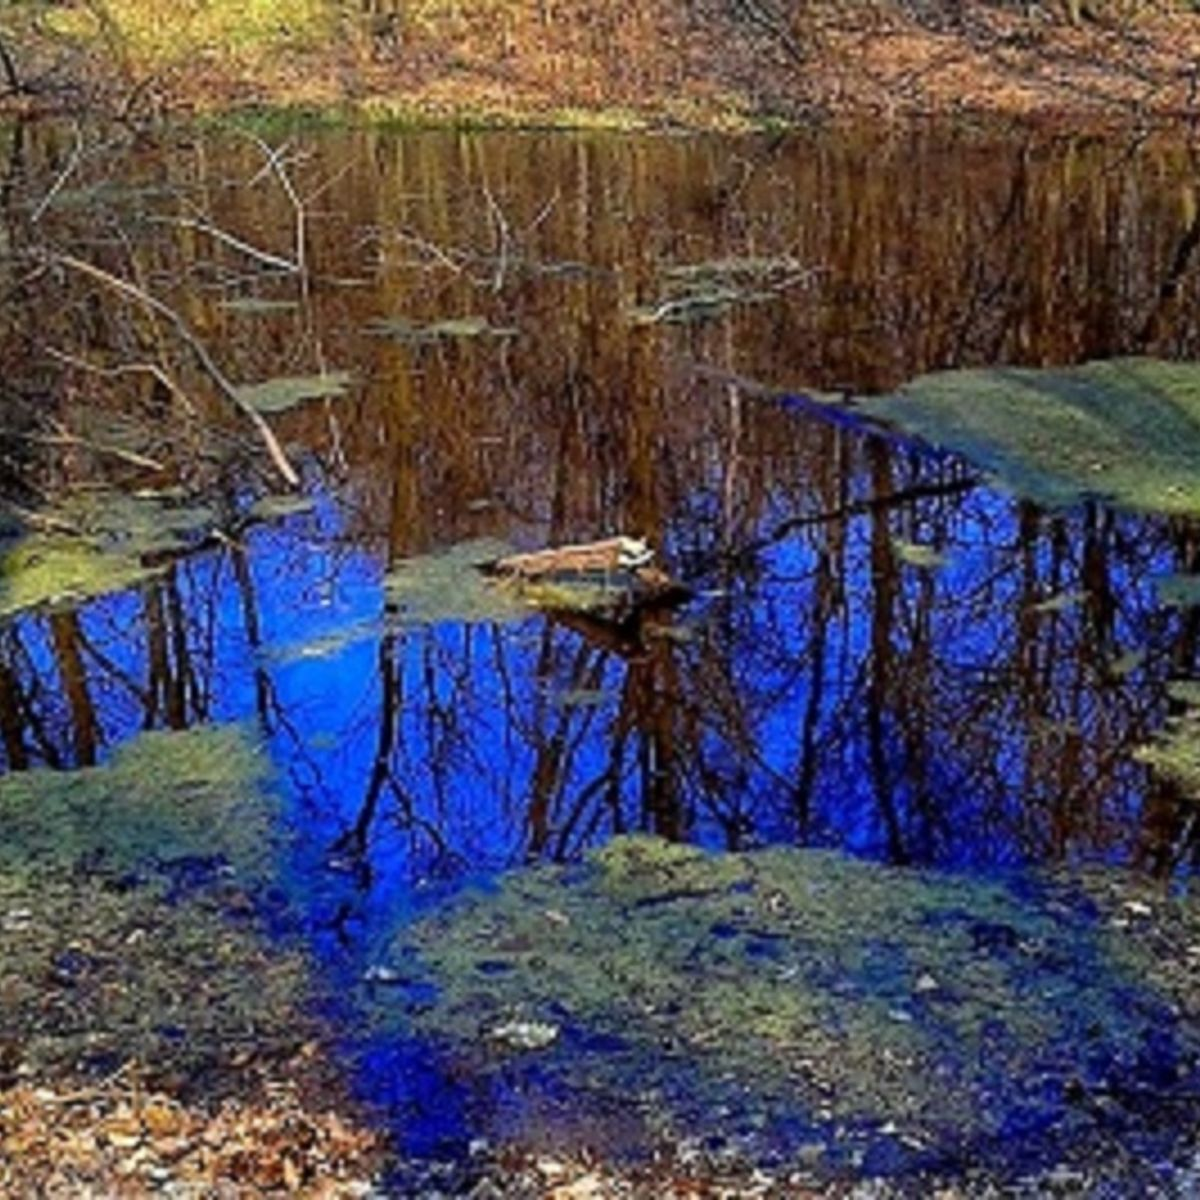 Giant_puddle.jpg